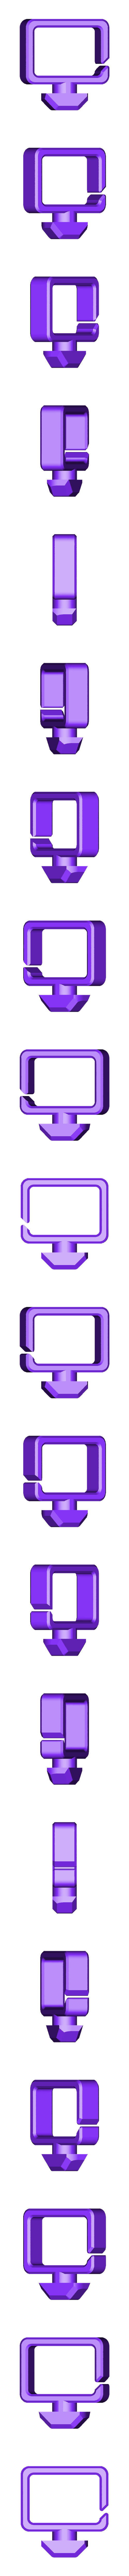 Ender3_2020.stl Download free STL file 2020 V Profile Cable Clip (Ender3) • 3D printing template, a69291954